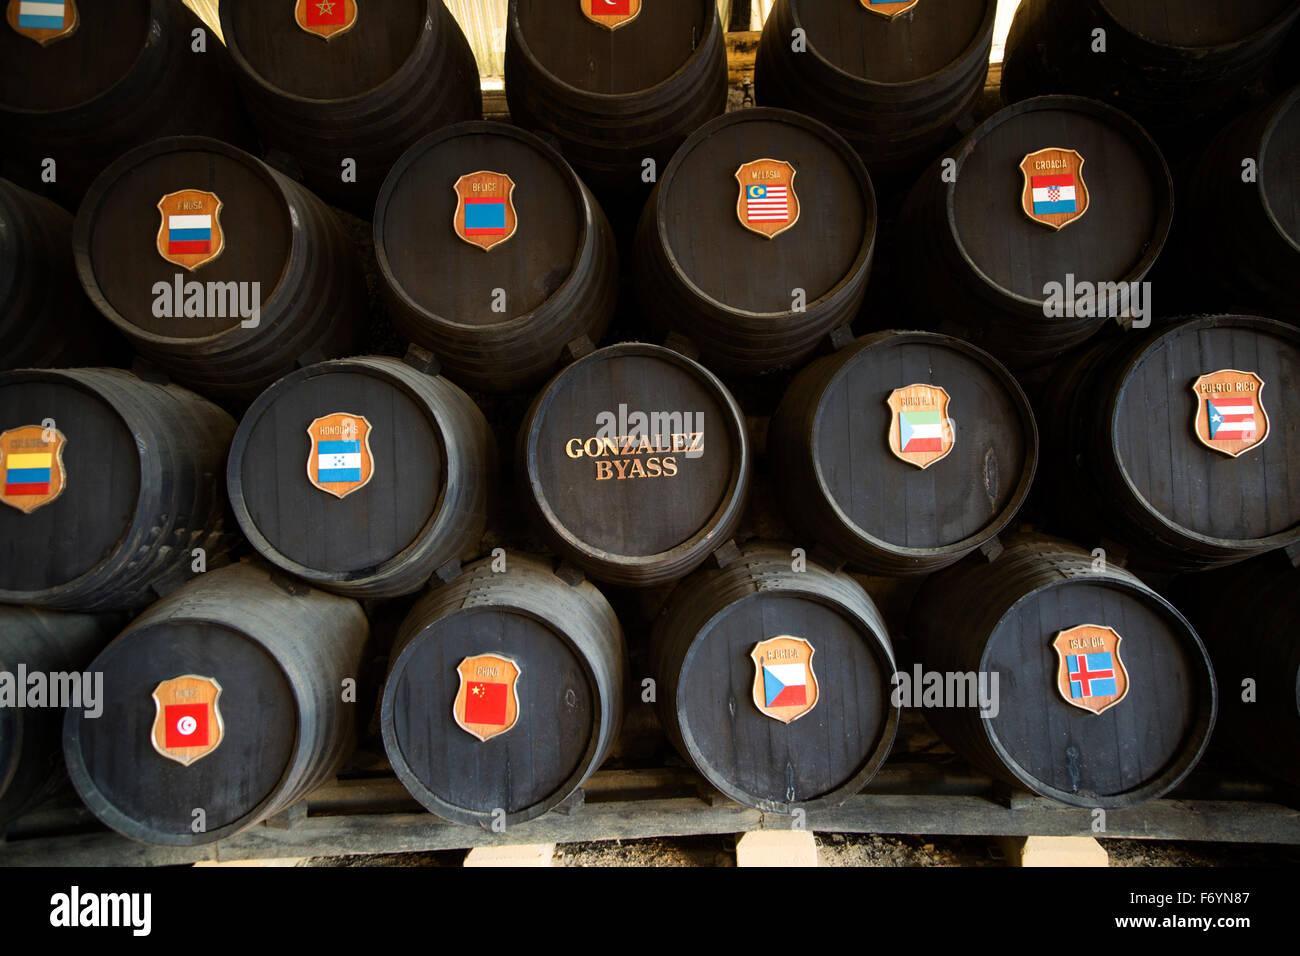 Oak barrels with national symbols of countries exported to from Gonzalez Byass bodega, Jerez de la Frontera, Spain - Stock Image